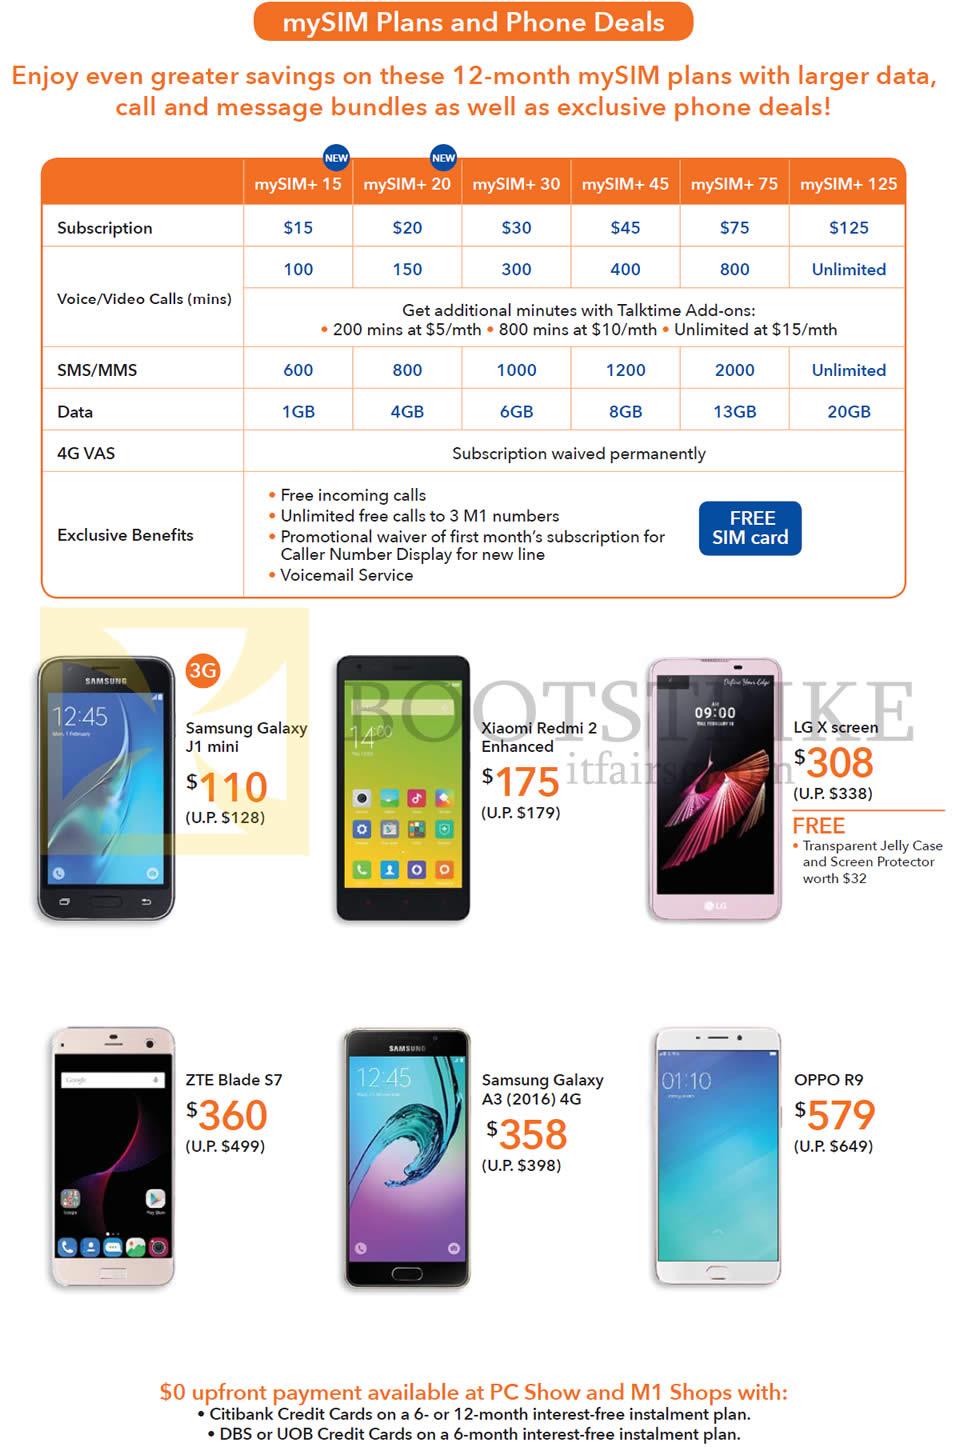 m1 mobile mysim plans phone deals mysim plus 15 samsung